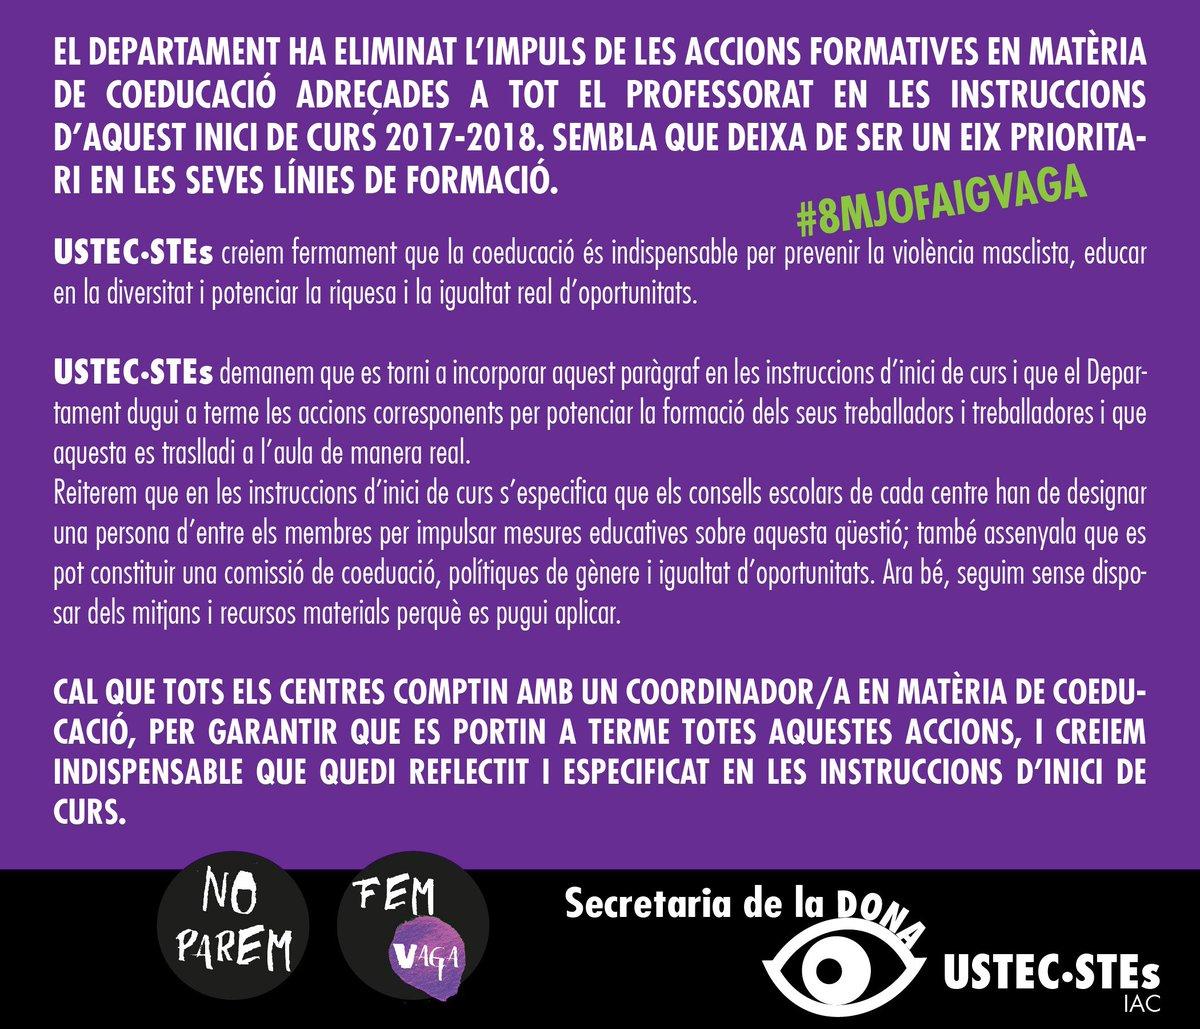 Secre Dona USTEC-STEs's photo on #8MJoFaigVaga